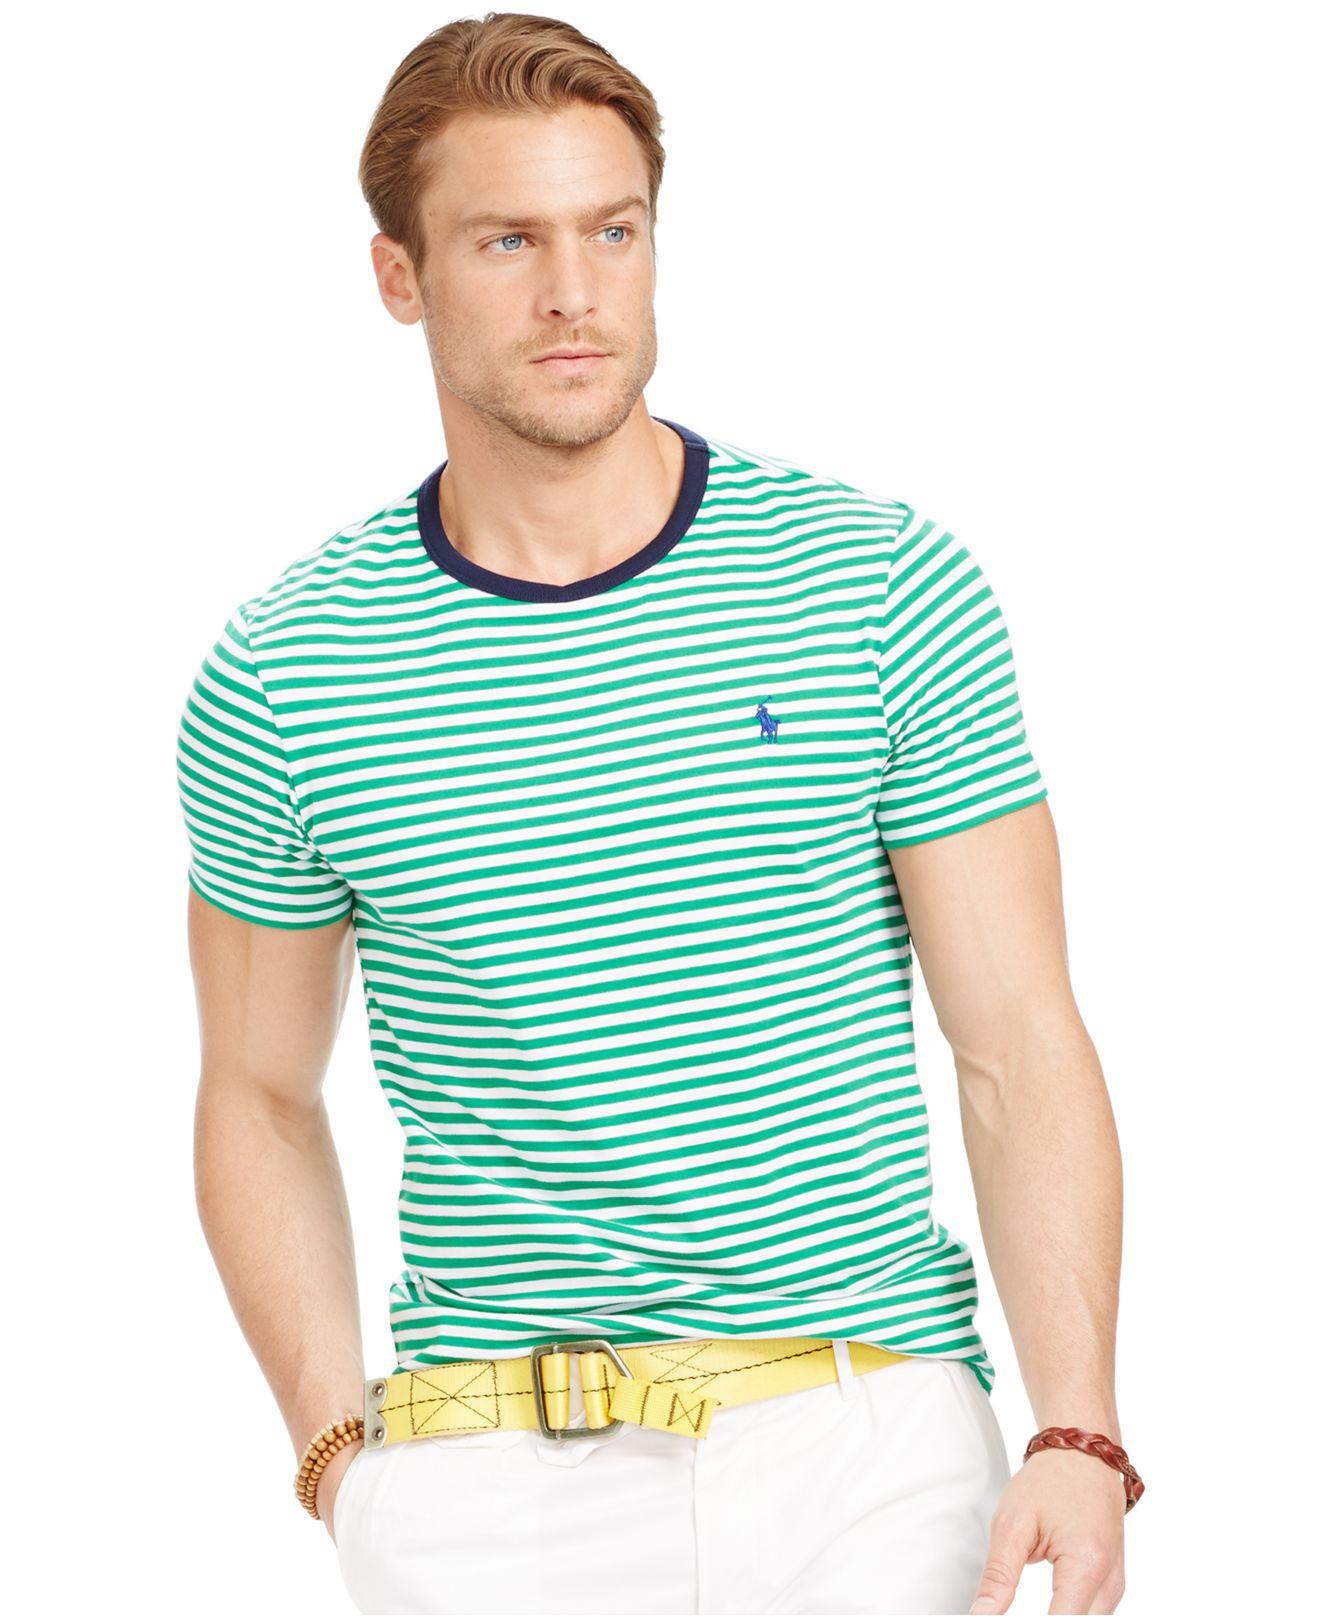 Lyst Polo Ralph Lauren Striped Crew Neck T Shirt In Green For Men